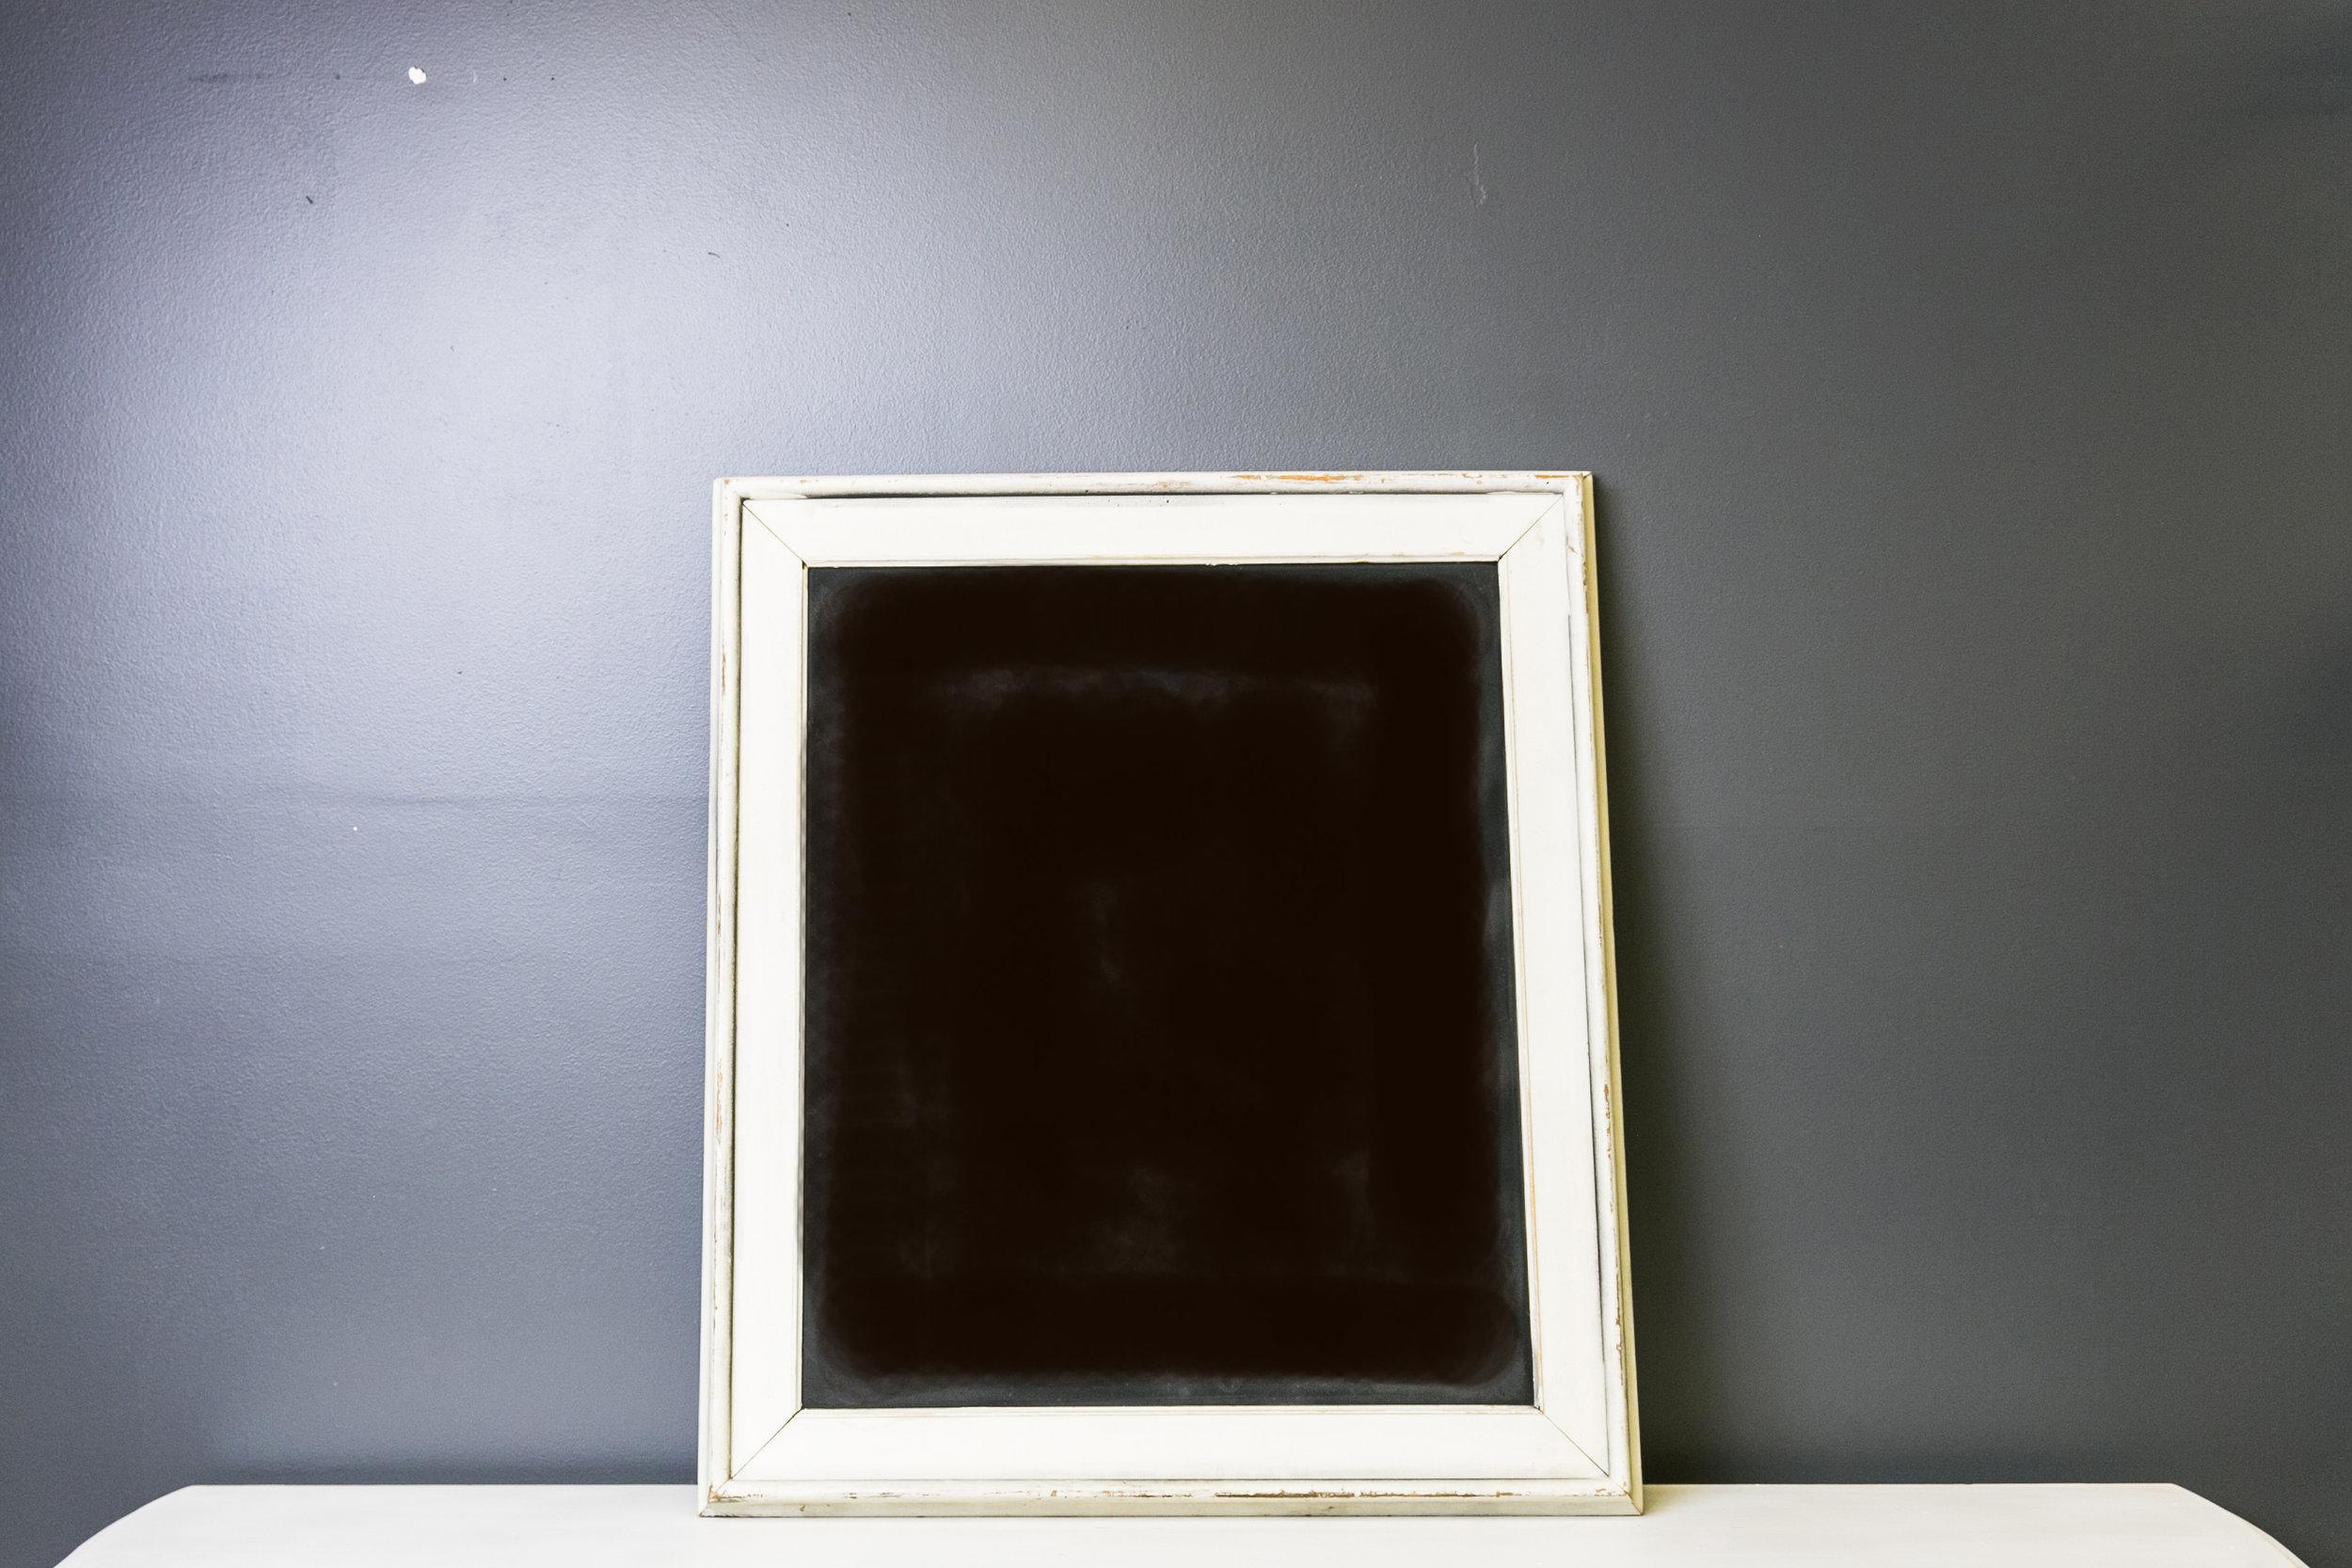 Kate chalkboard 30 x 25